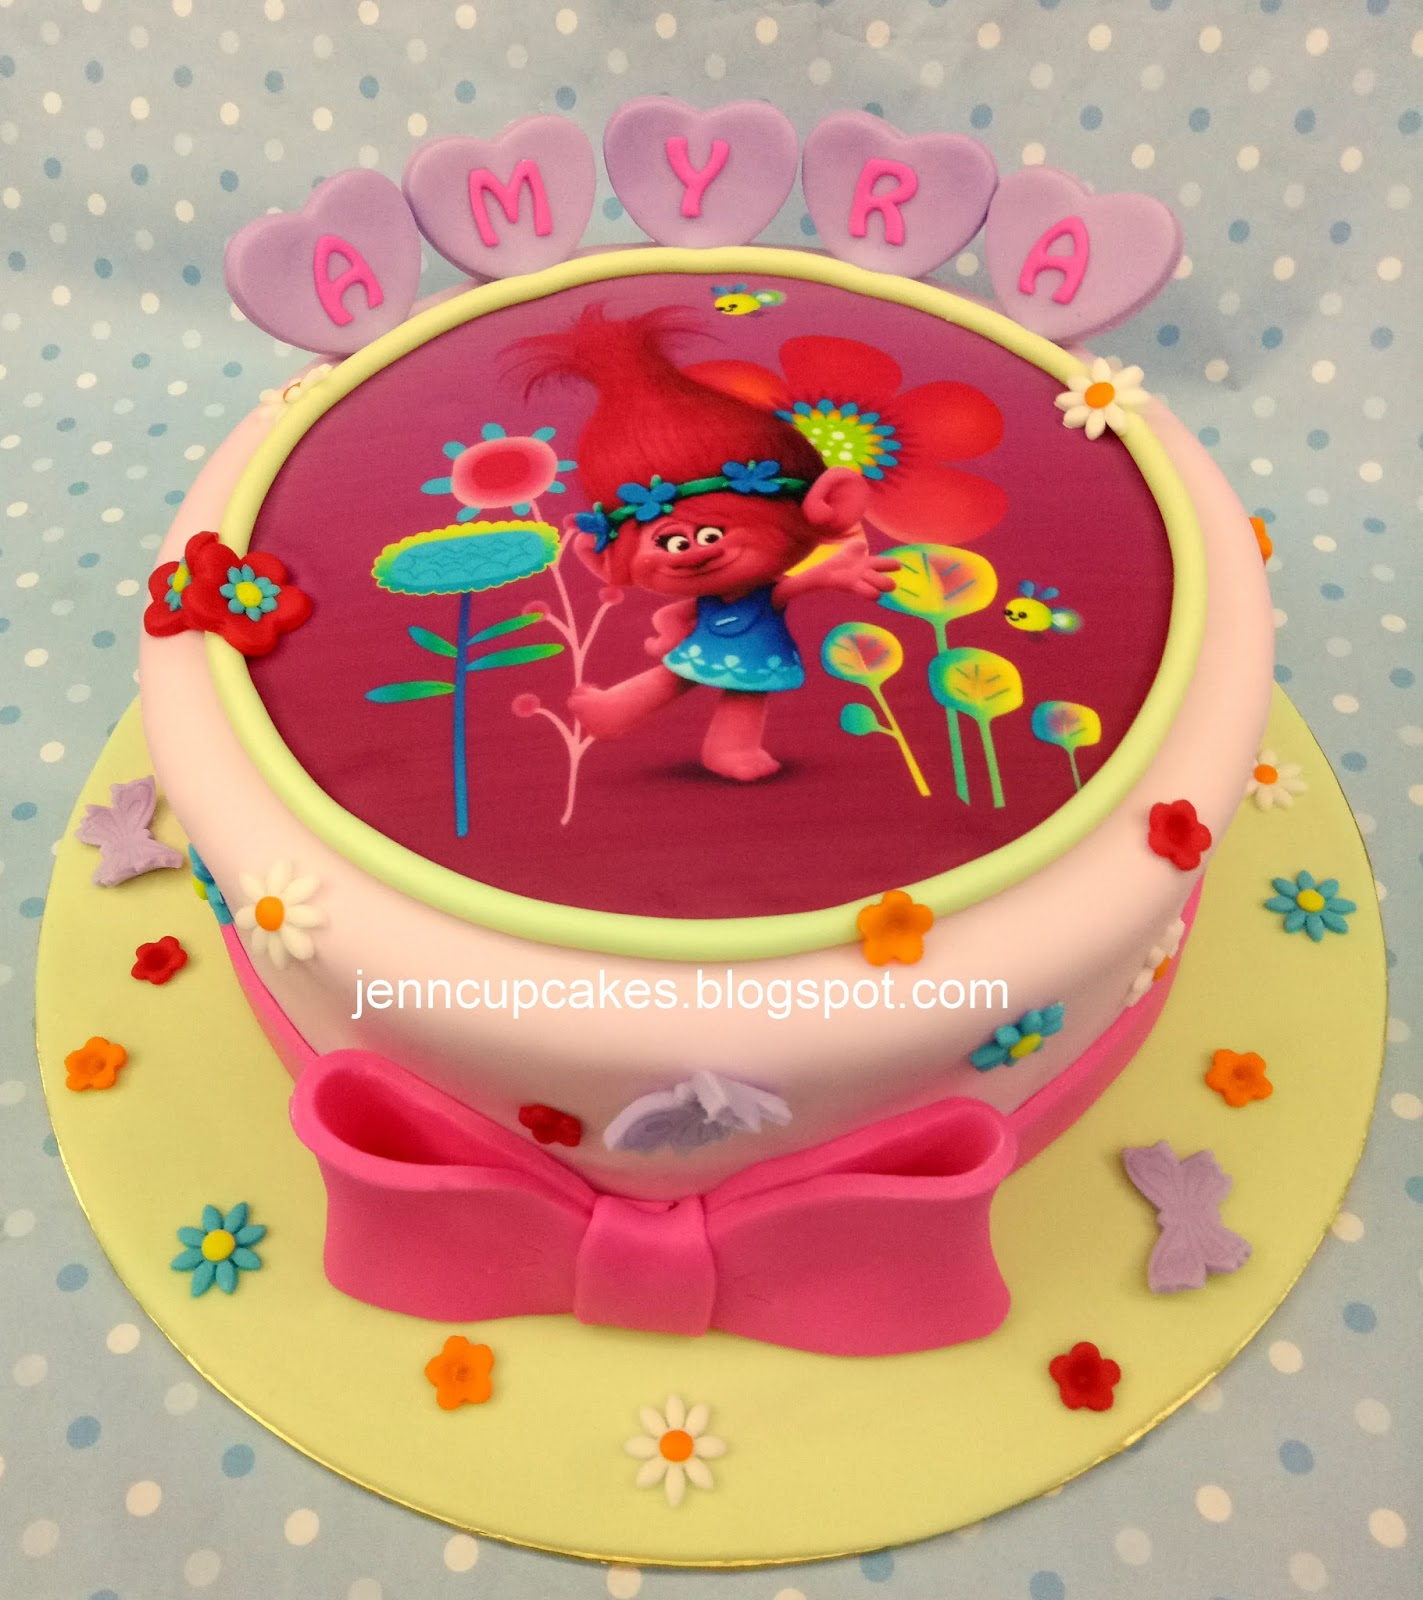 5kg Cake Images : Jenn Cupcakes & Muffins: Troll Image Cake